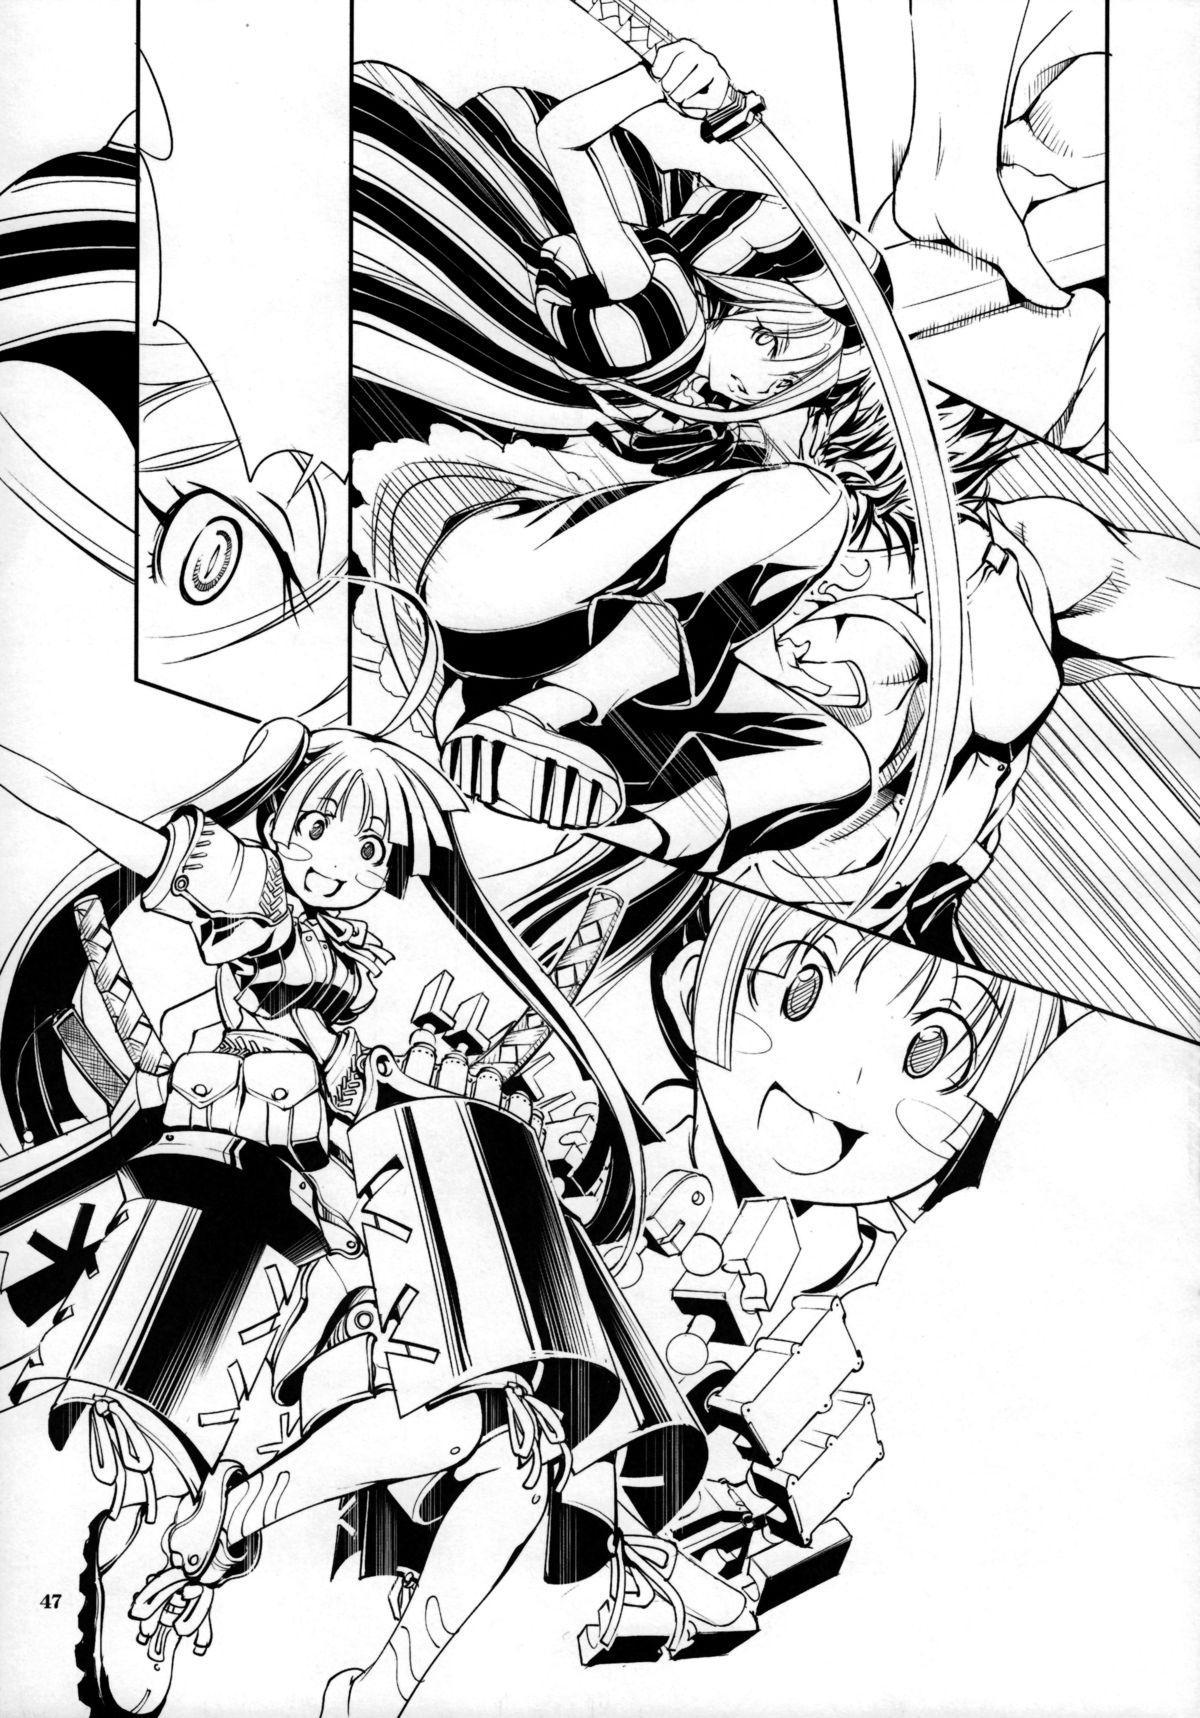 (C89) [Algolagnia (Mikoshiro Honnin)] Naruto [saga] sei (NARUTO) 46